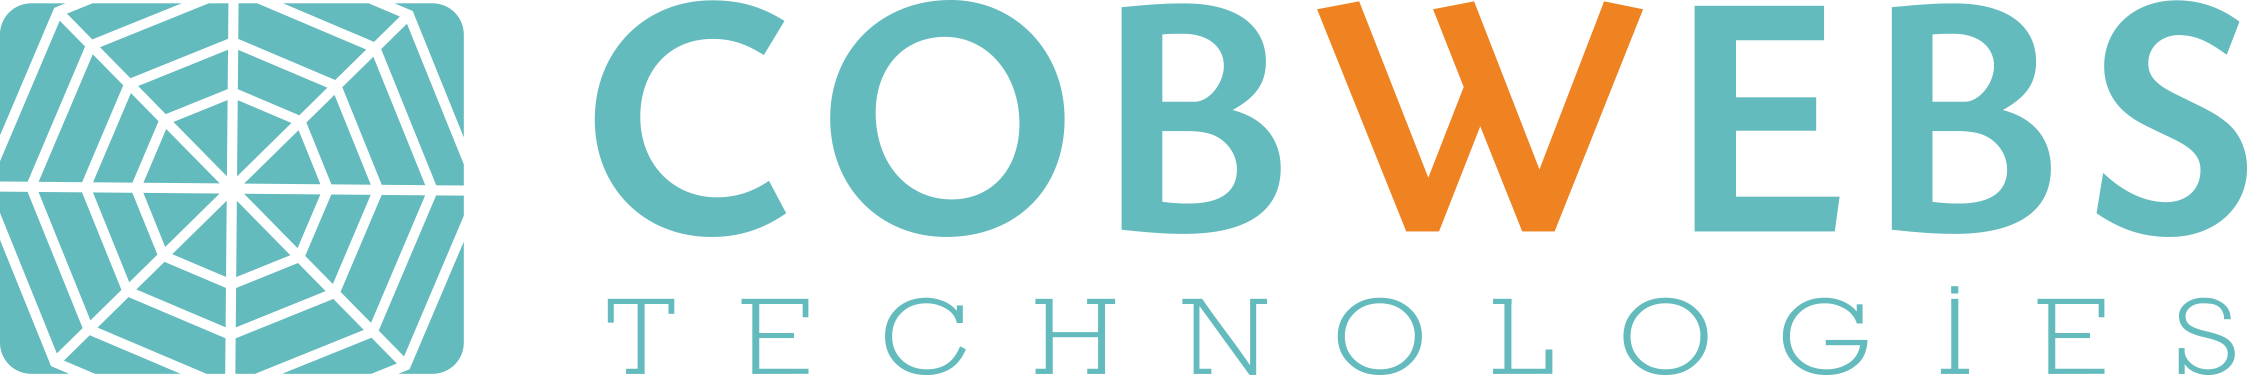 Cobwebs Technologies 会社ロゴ